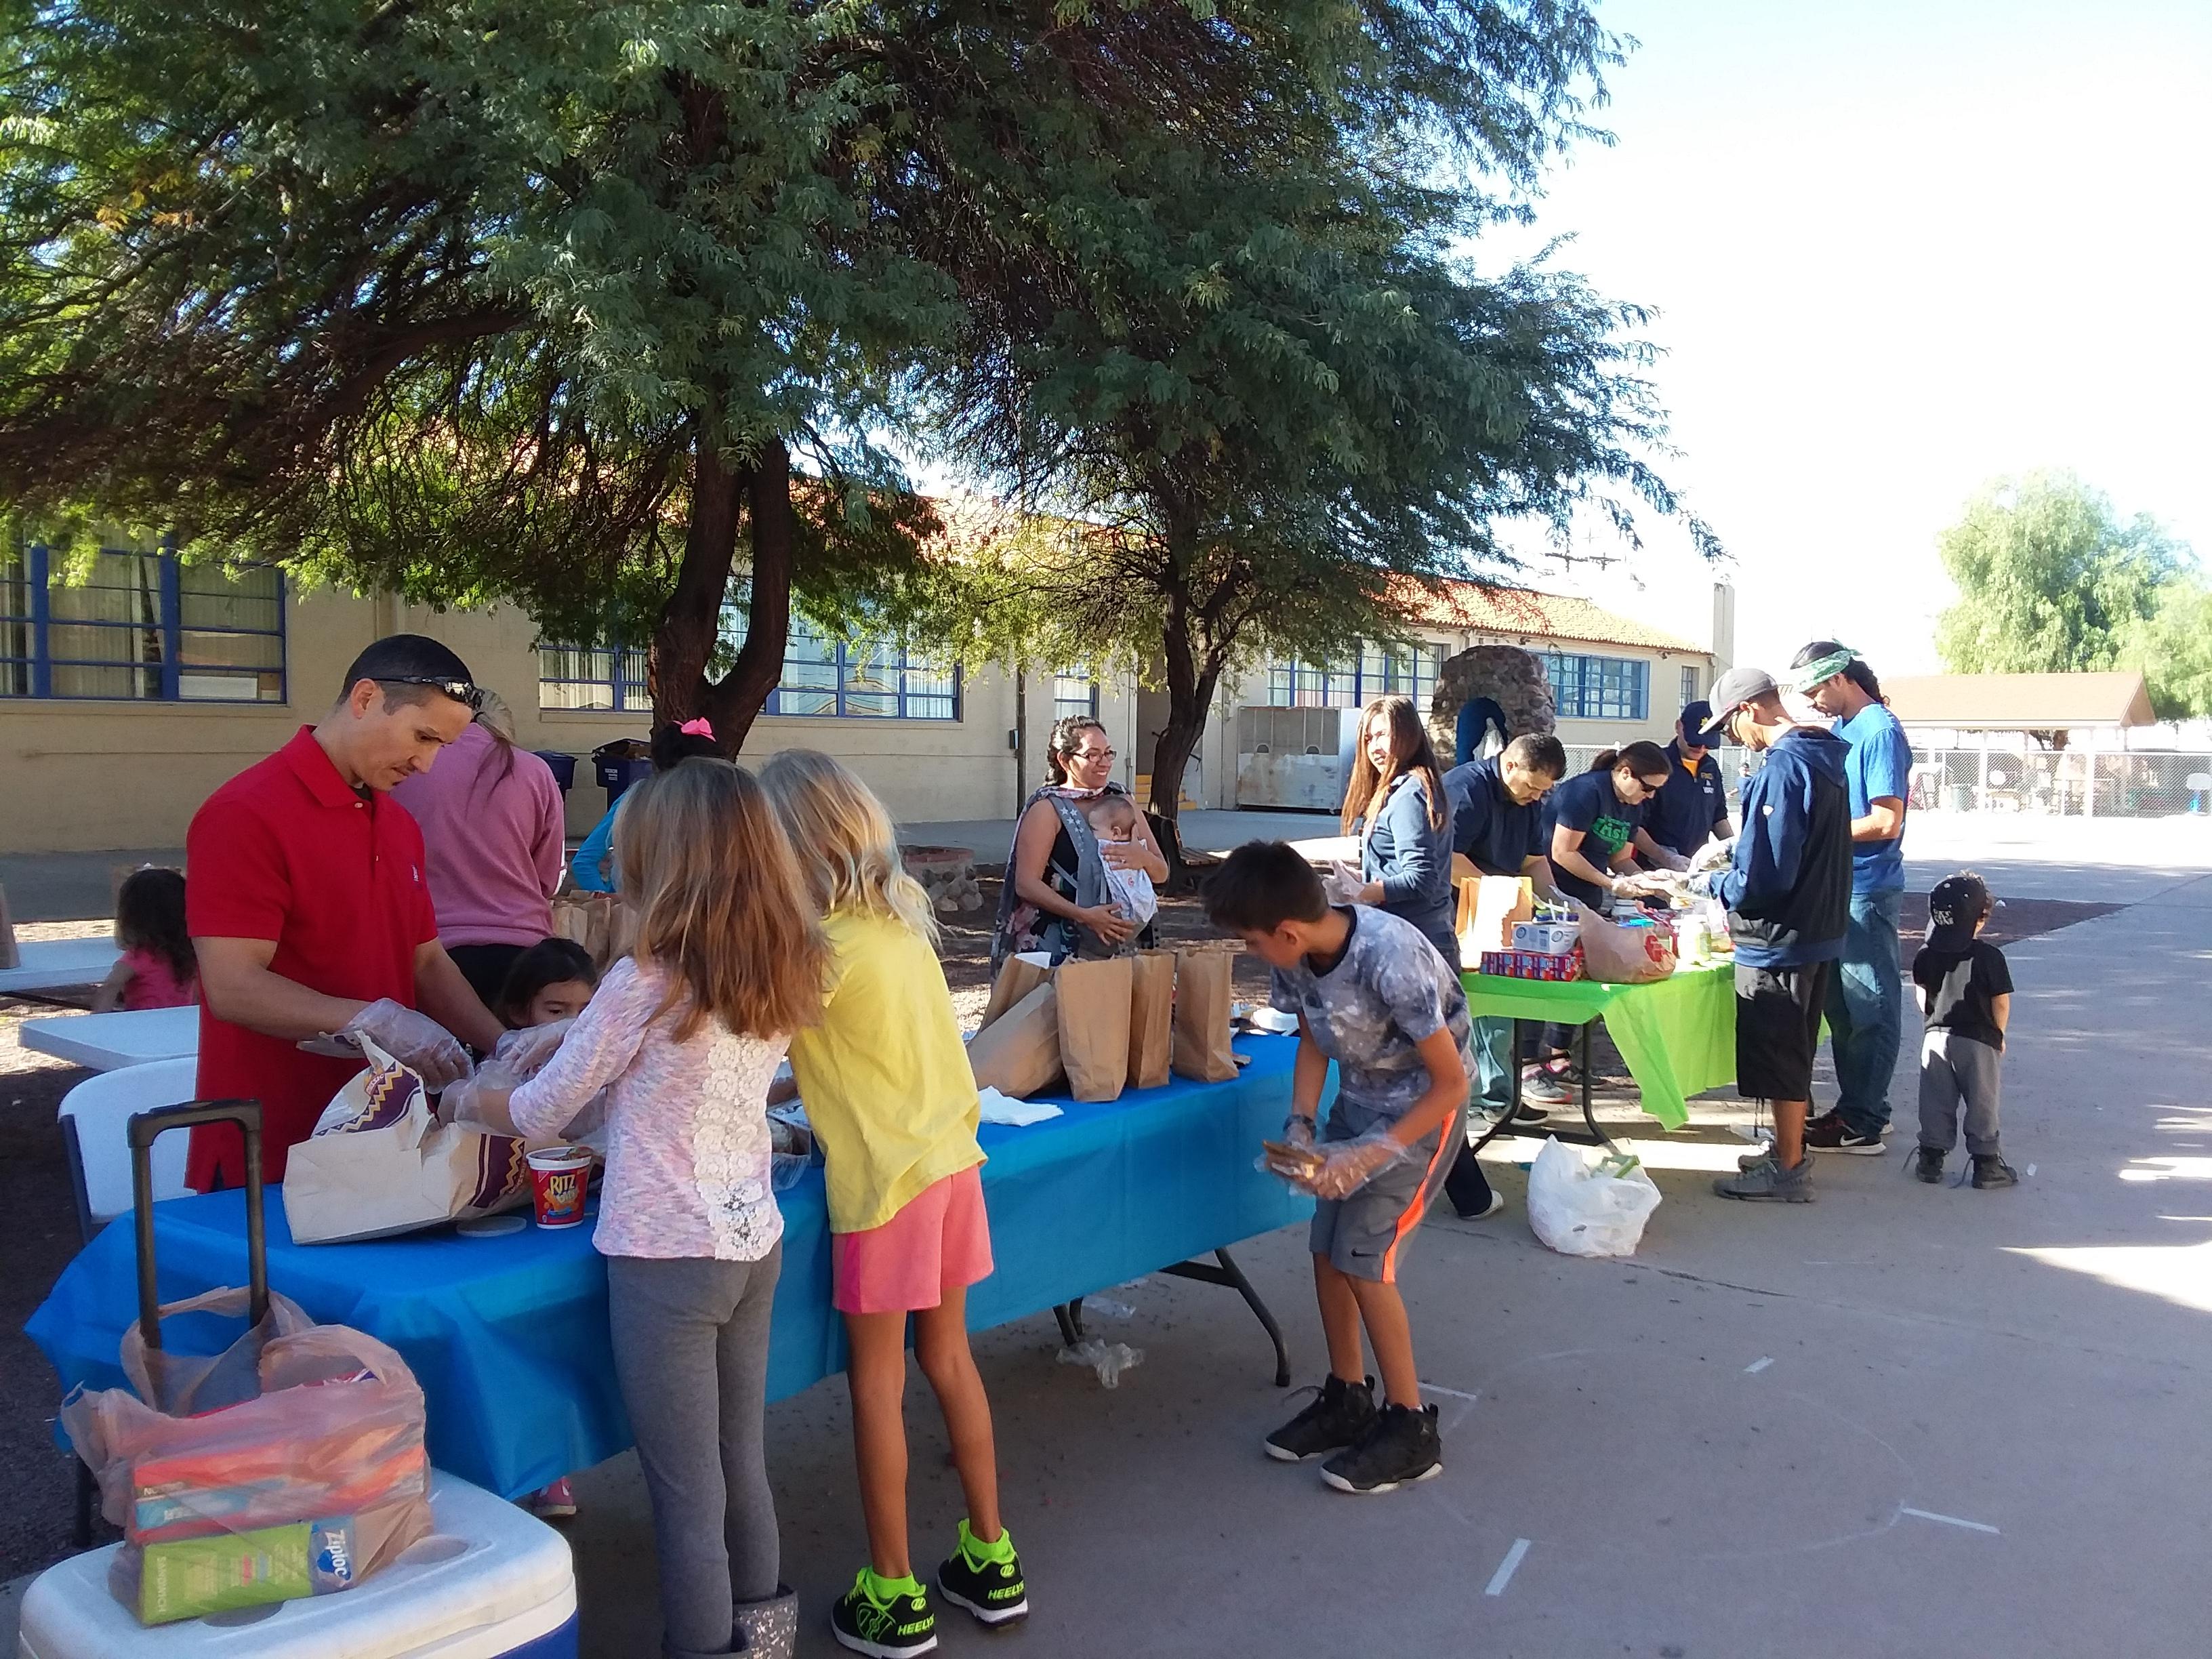 Action_Tucson_1.jpg